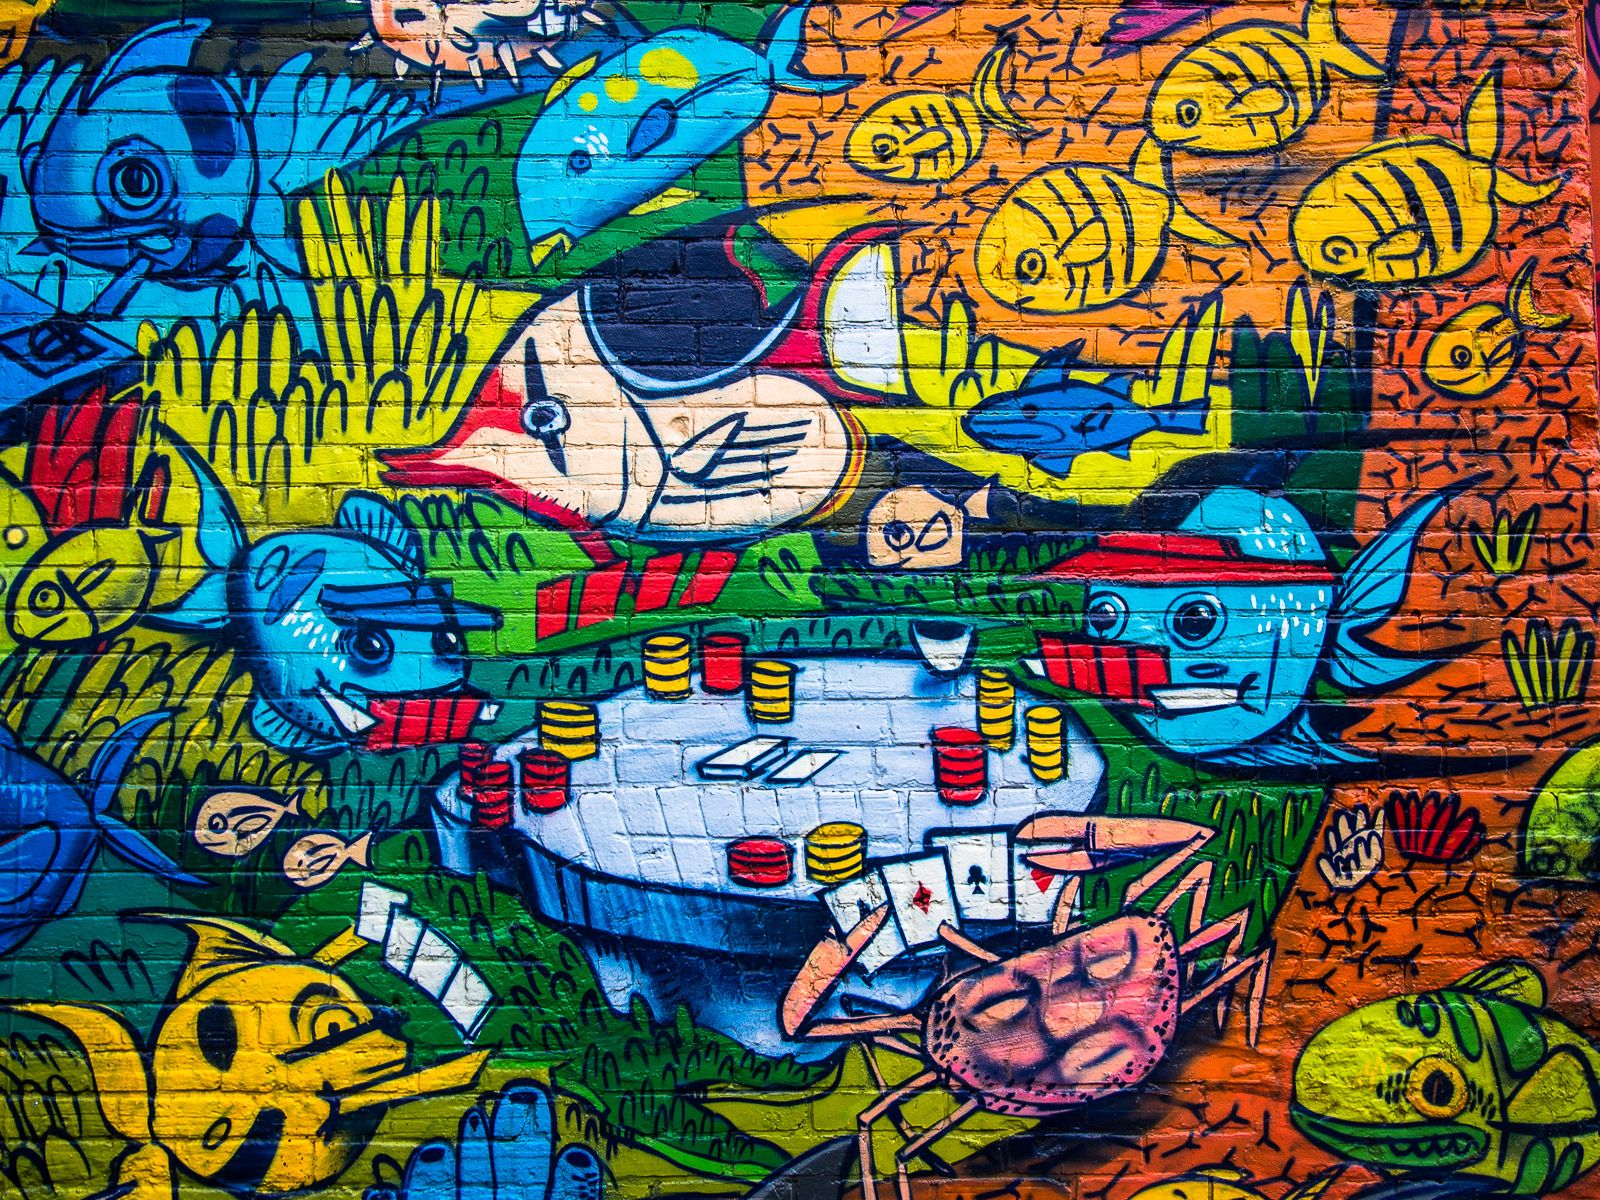 Fish playing poker uber street art painting art